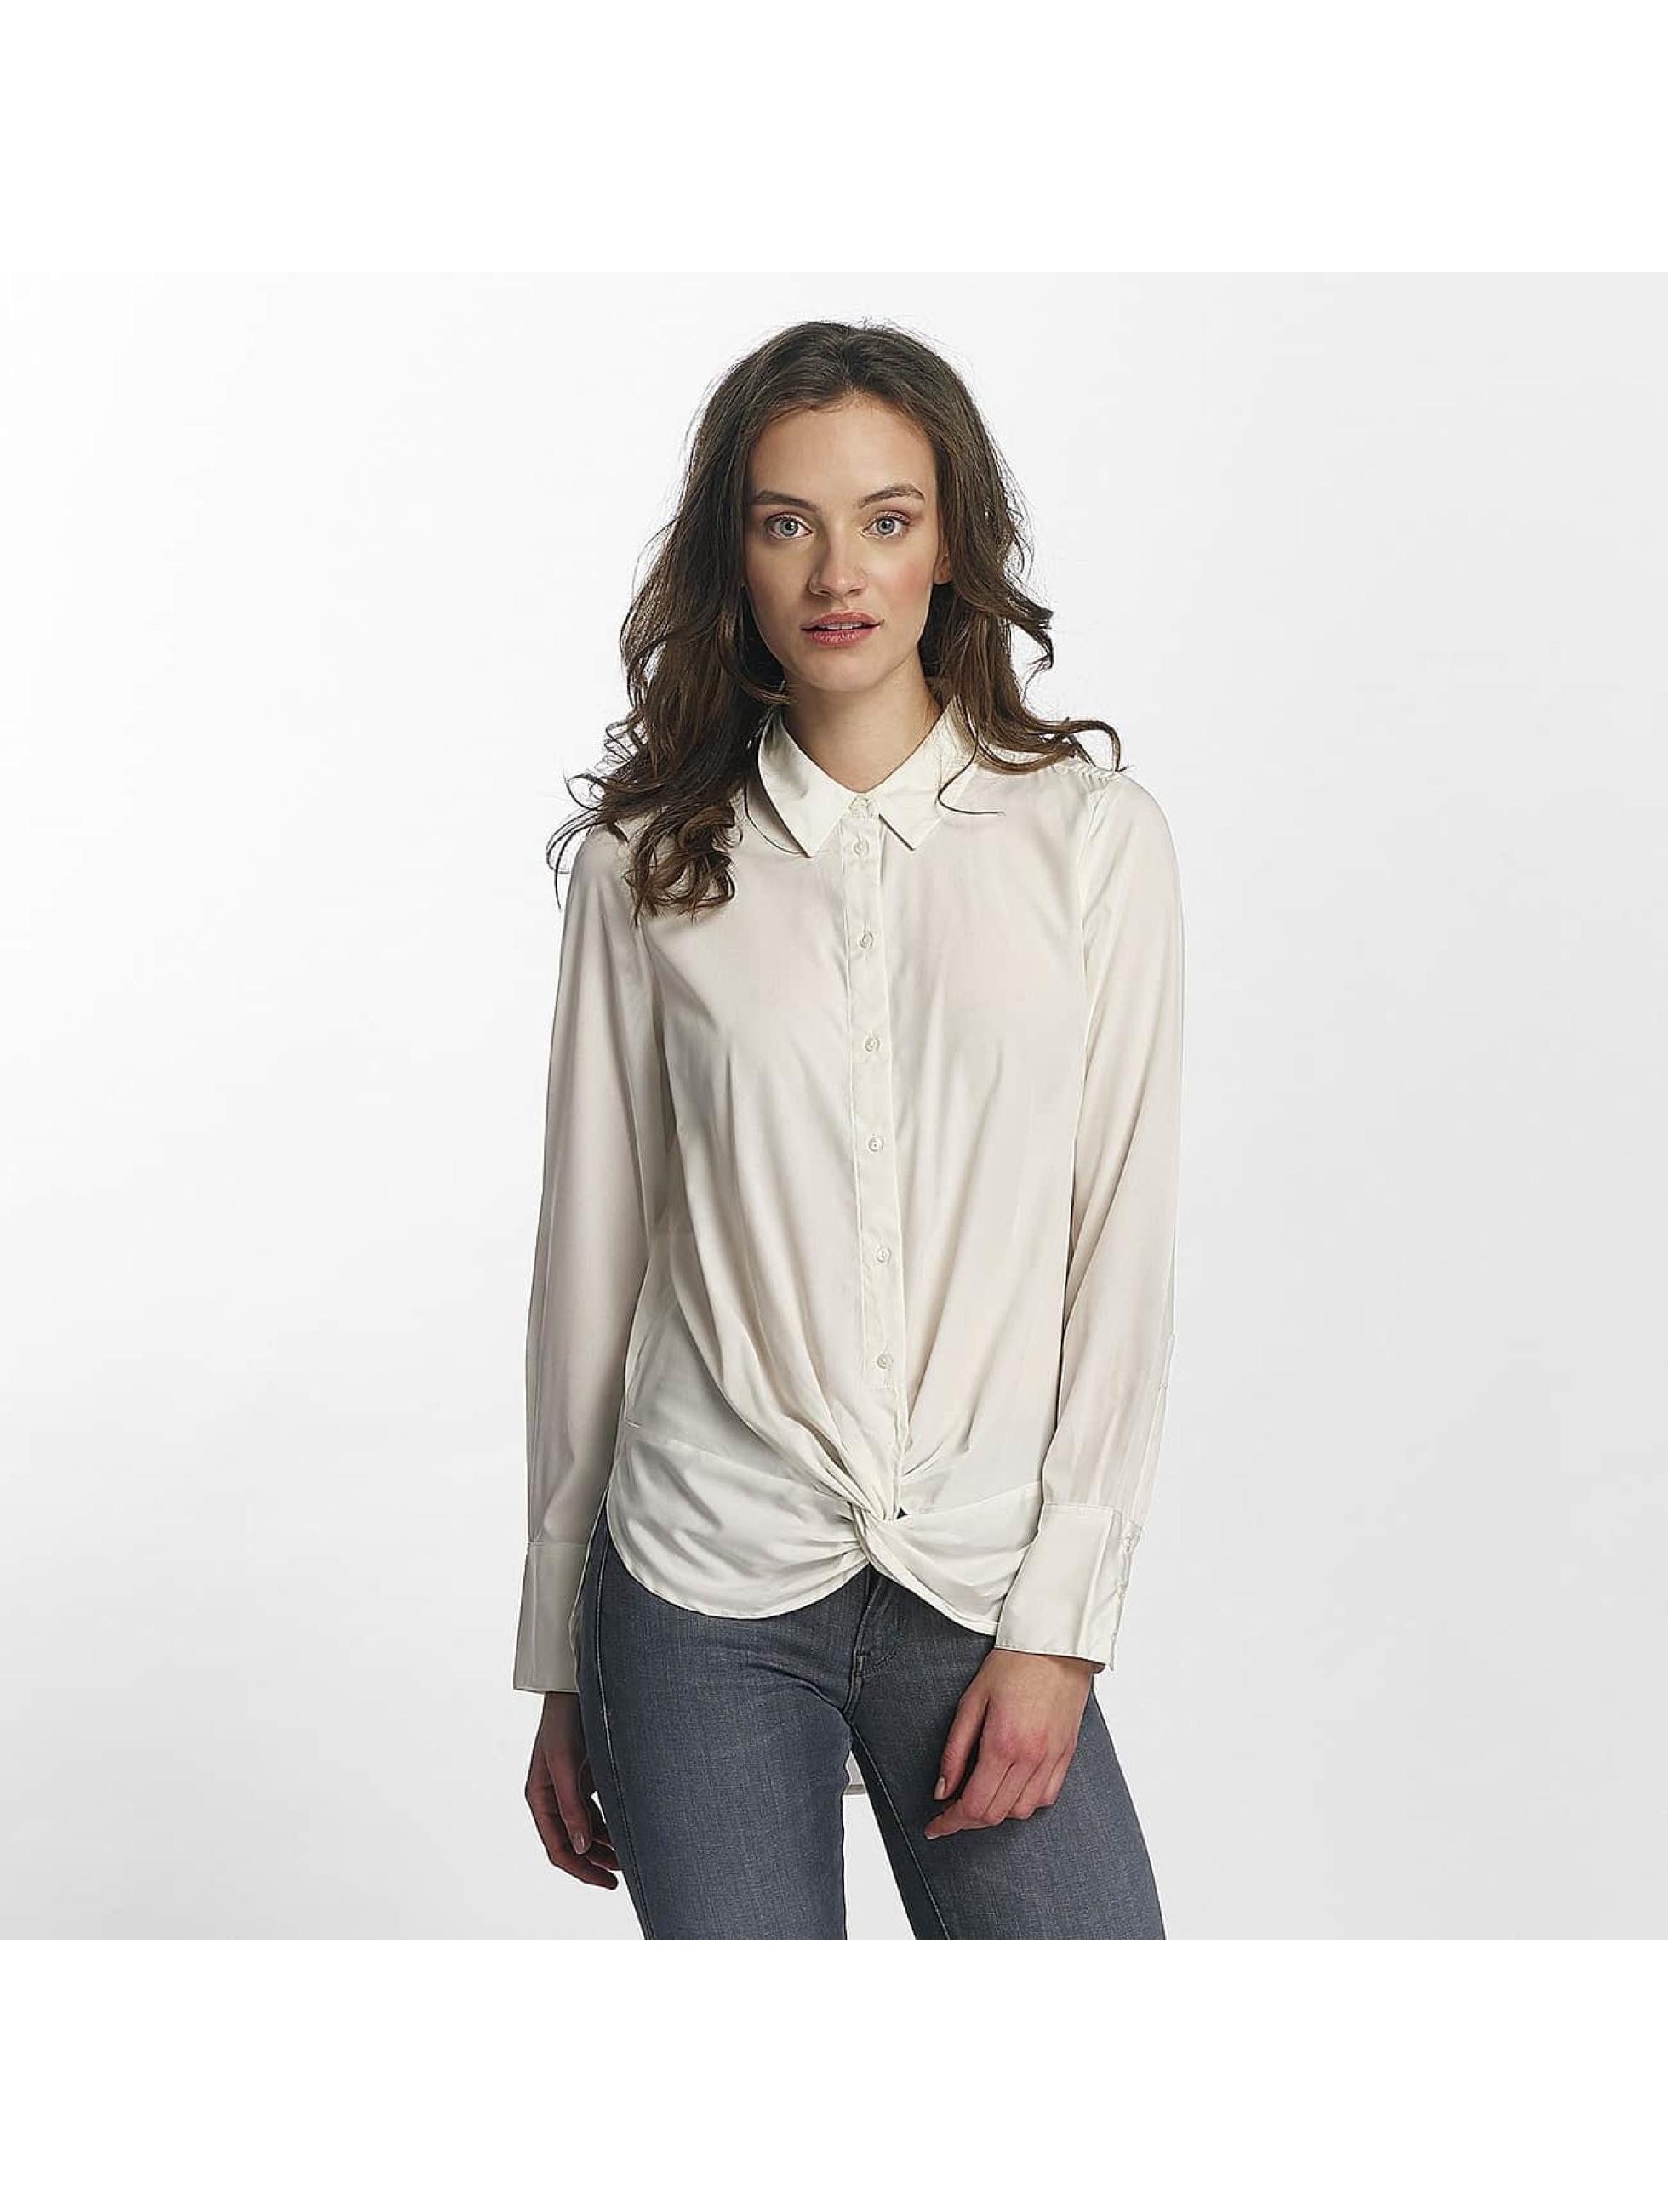 Vero Moda Frauen Hemd vmBind in weiß